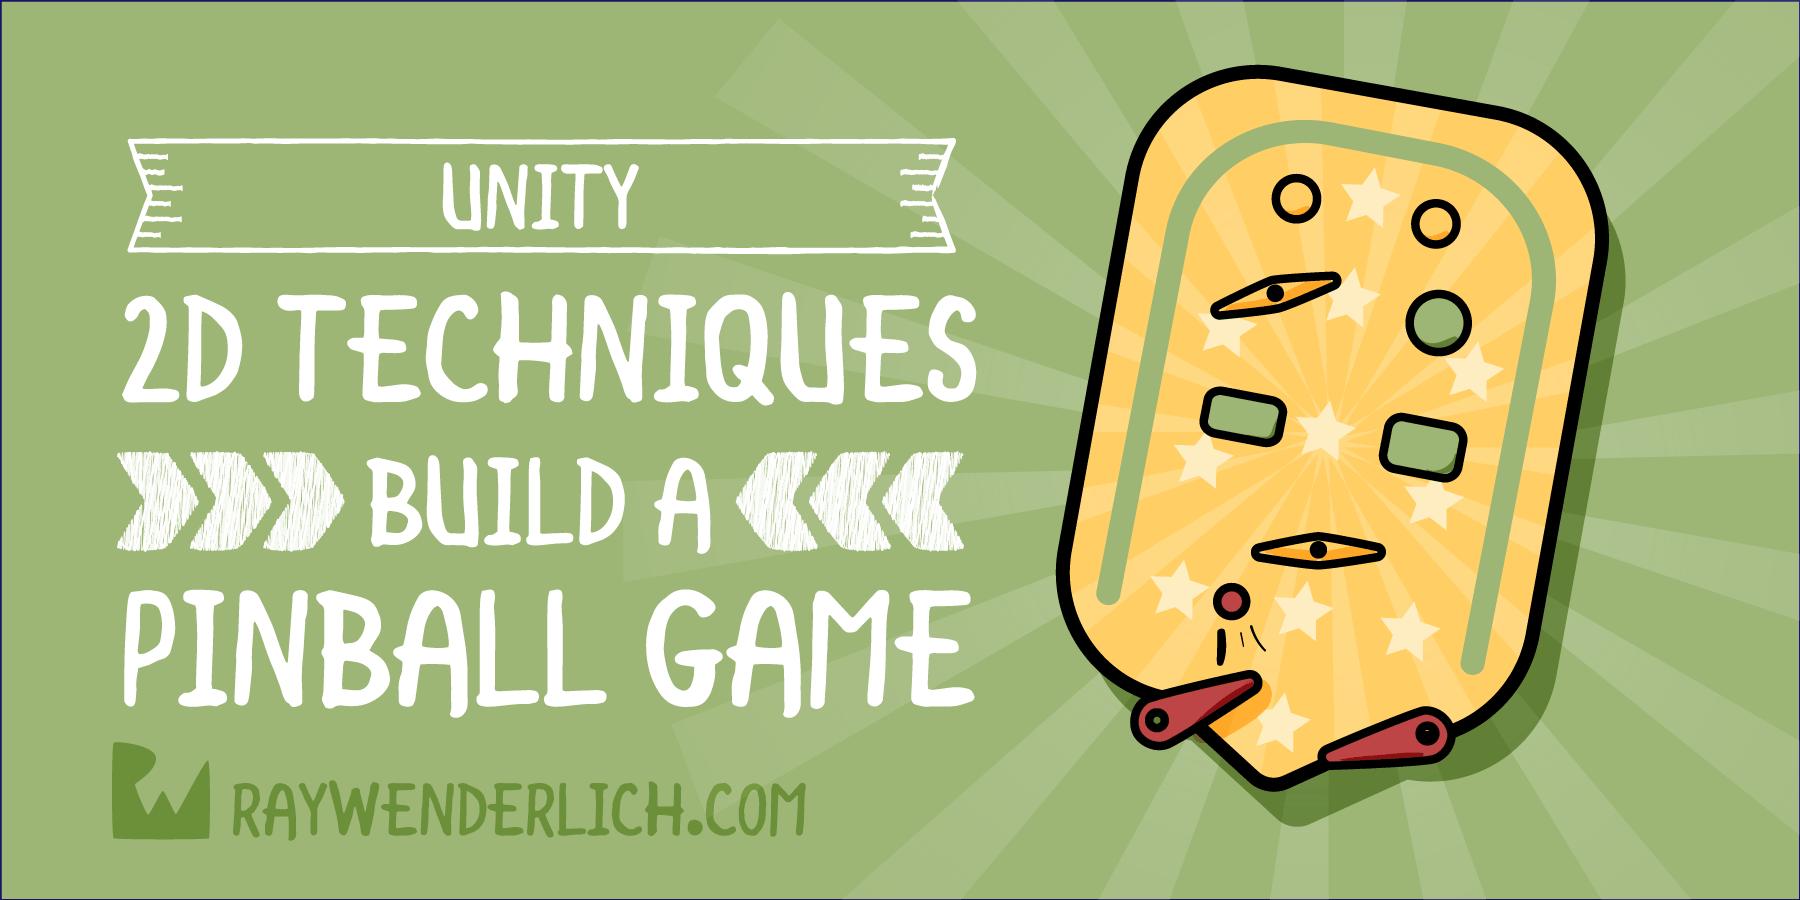 Unity 2017 2D Techniques: Build a 2D Pinball game